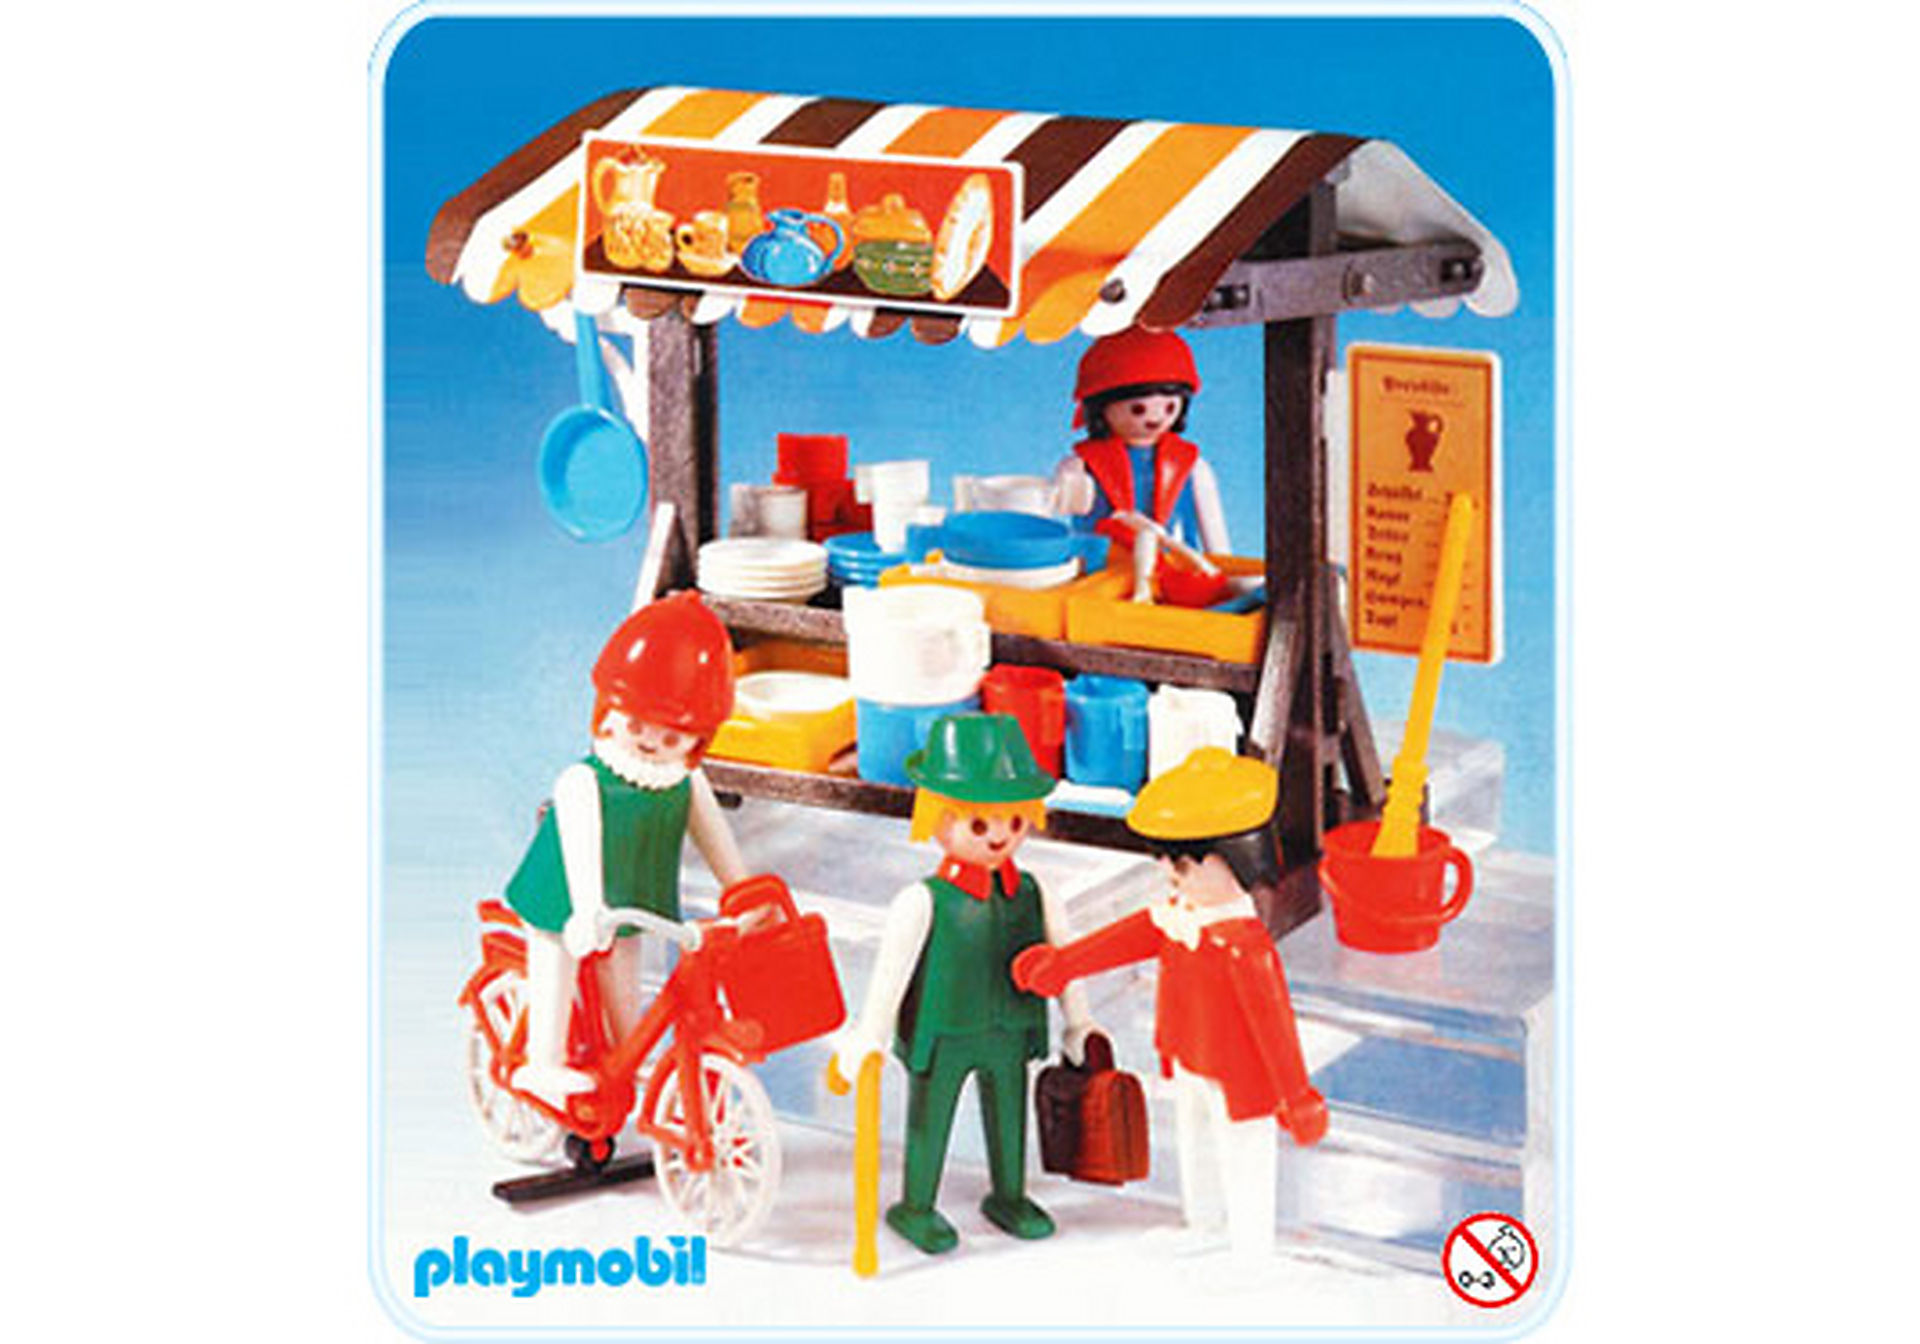 http://media.playmobil.com/i/playmobil/3486-A_product_detail/Marktleben